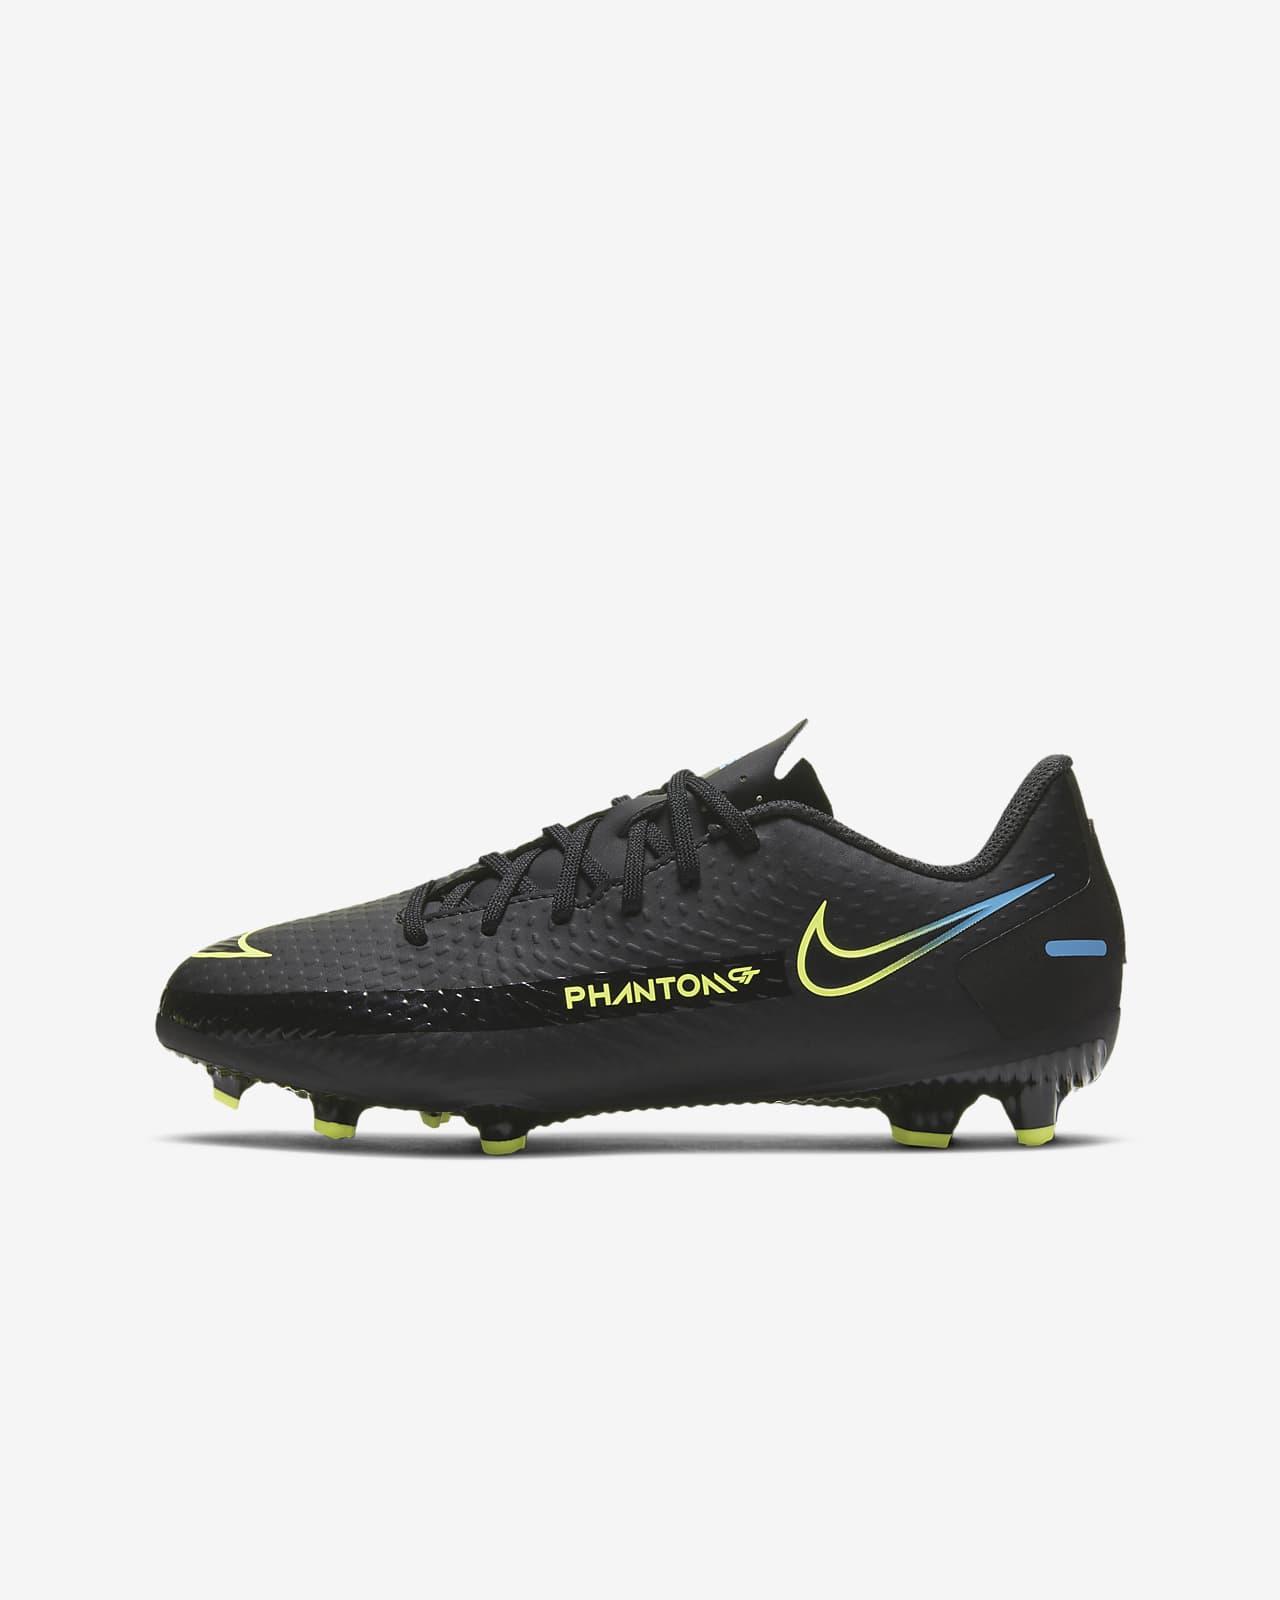 Scarpa da calcio multiterreno Nike Jr. Phantom GT Academy MG - Bambini/Ragazzi